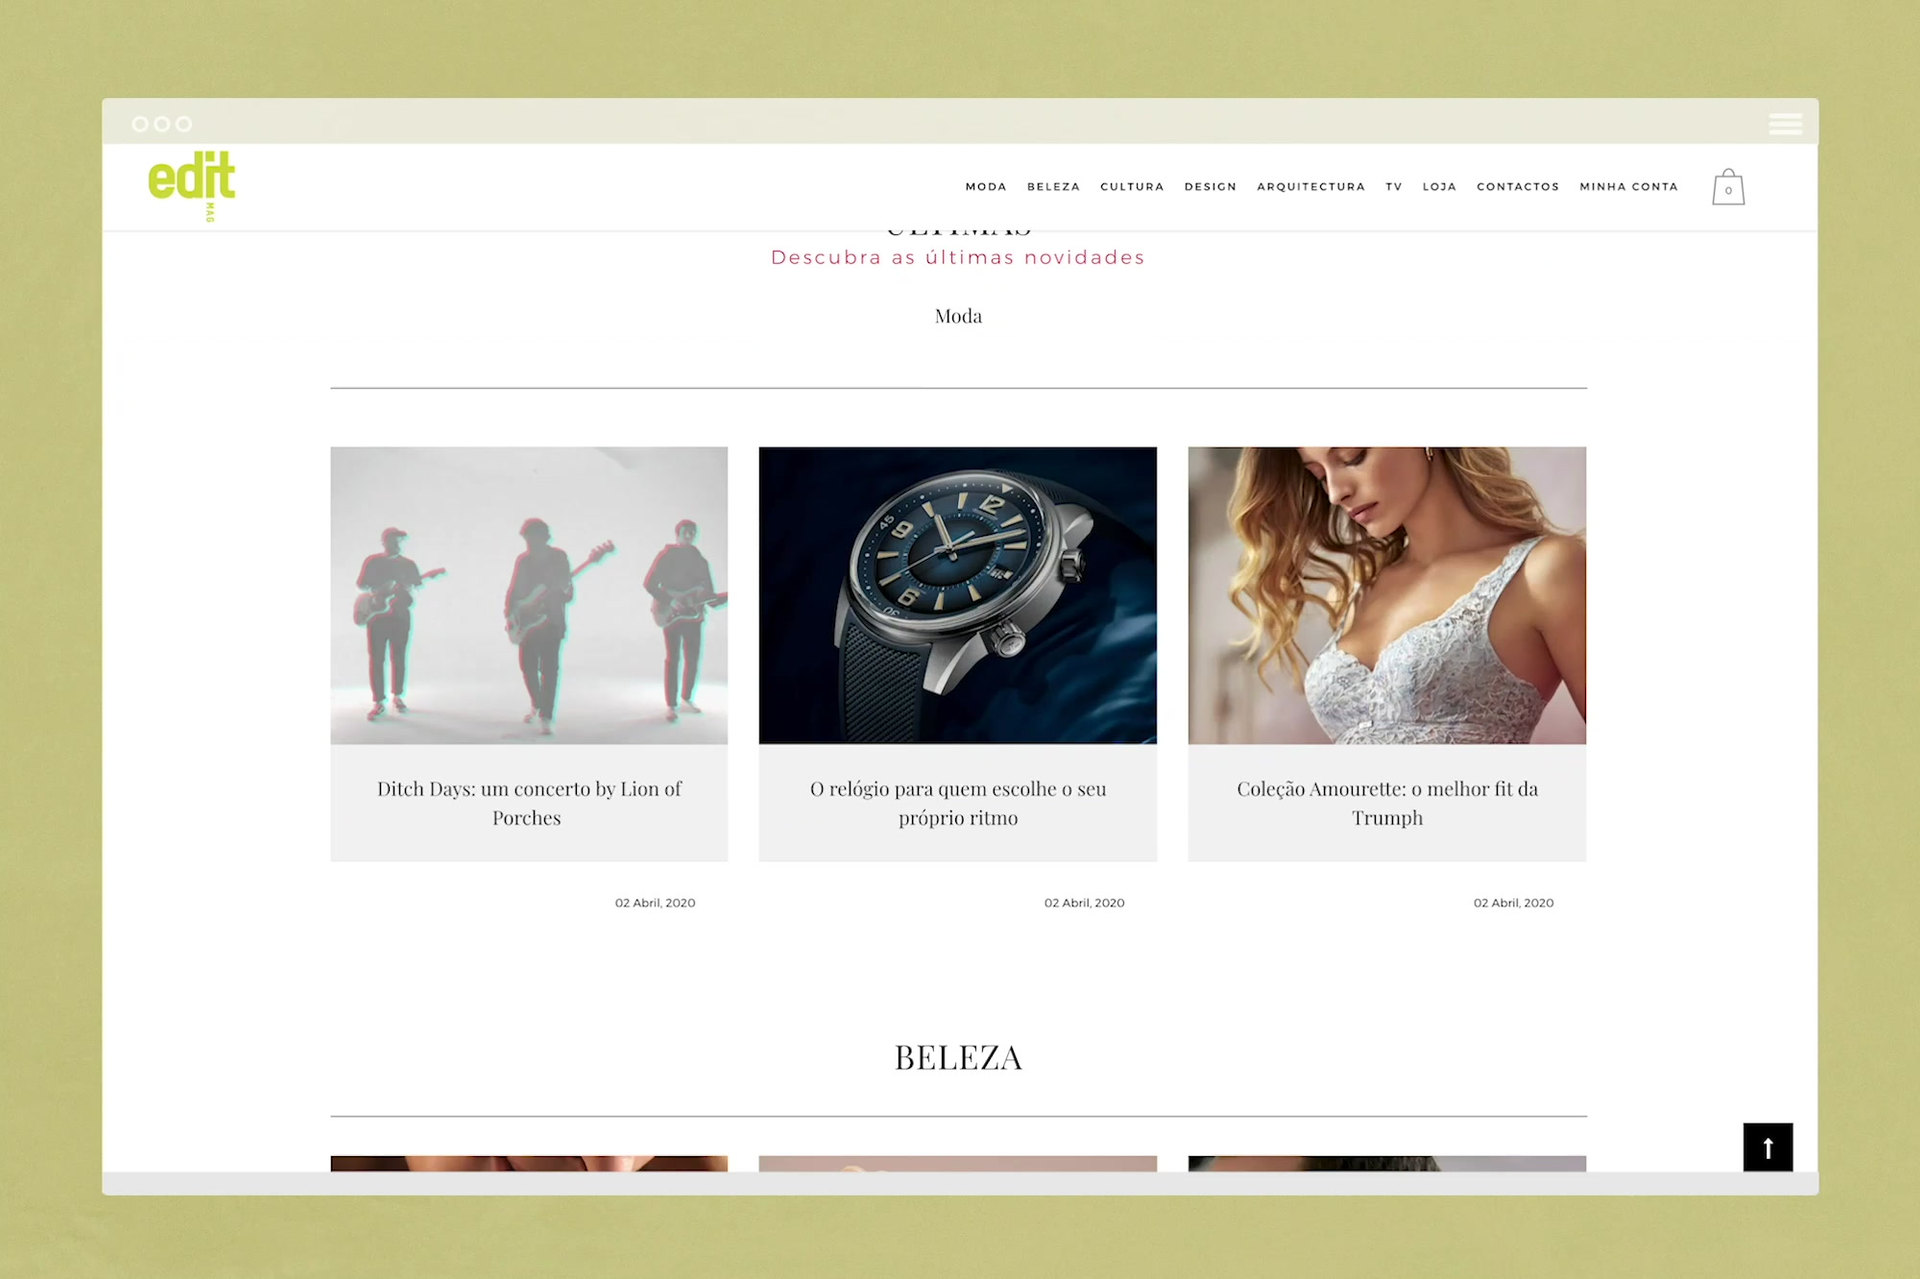 site edit_2.mp4